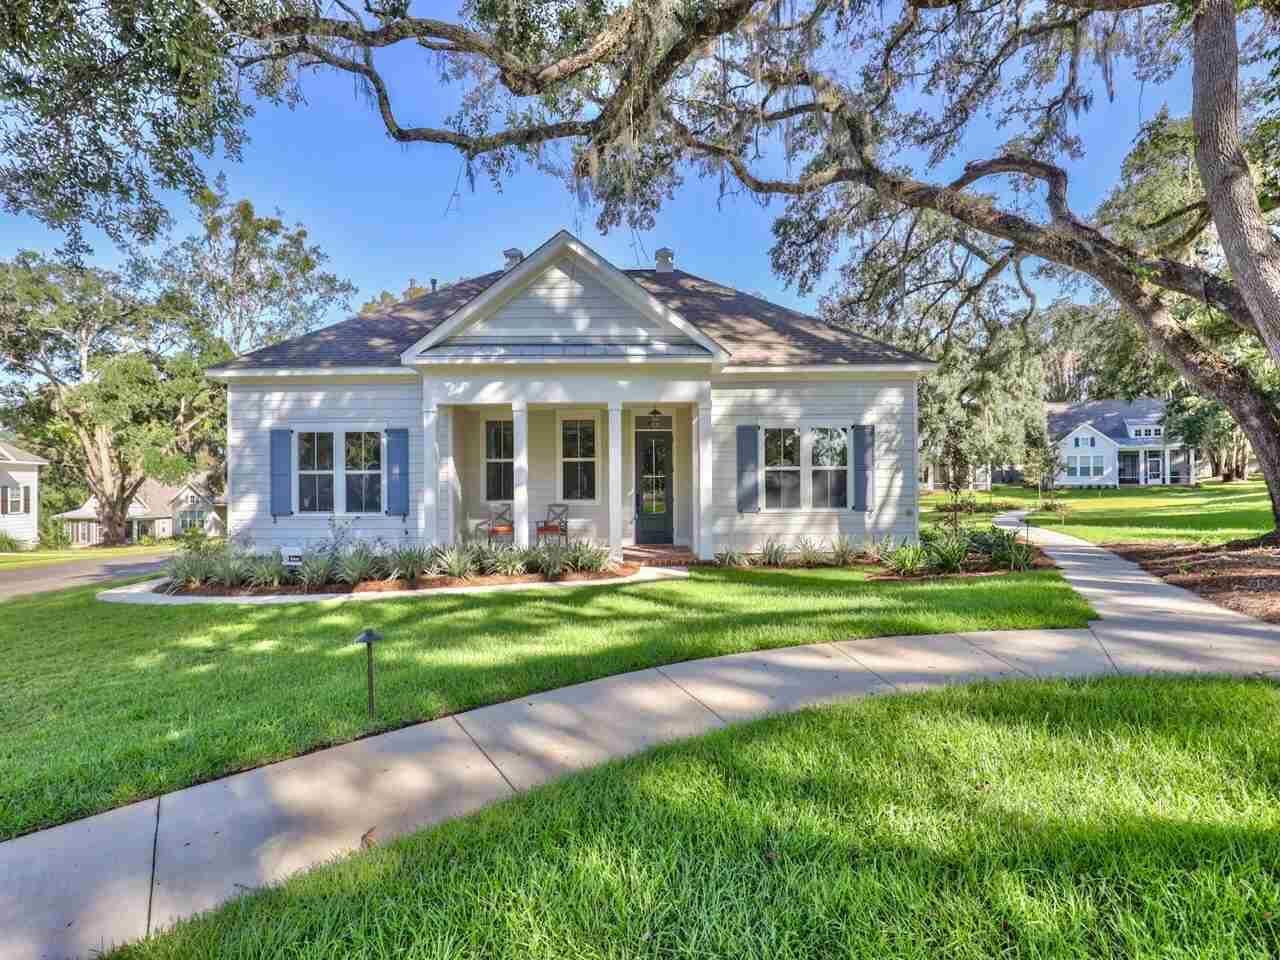 241 Camellia Oaks Avenue, Tallahassee, FL 32308 - MLS#: 322455